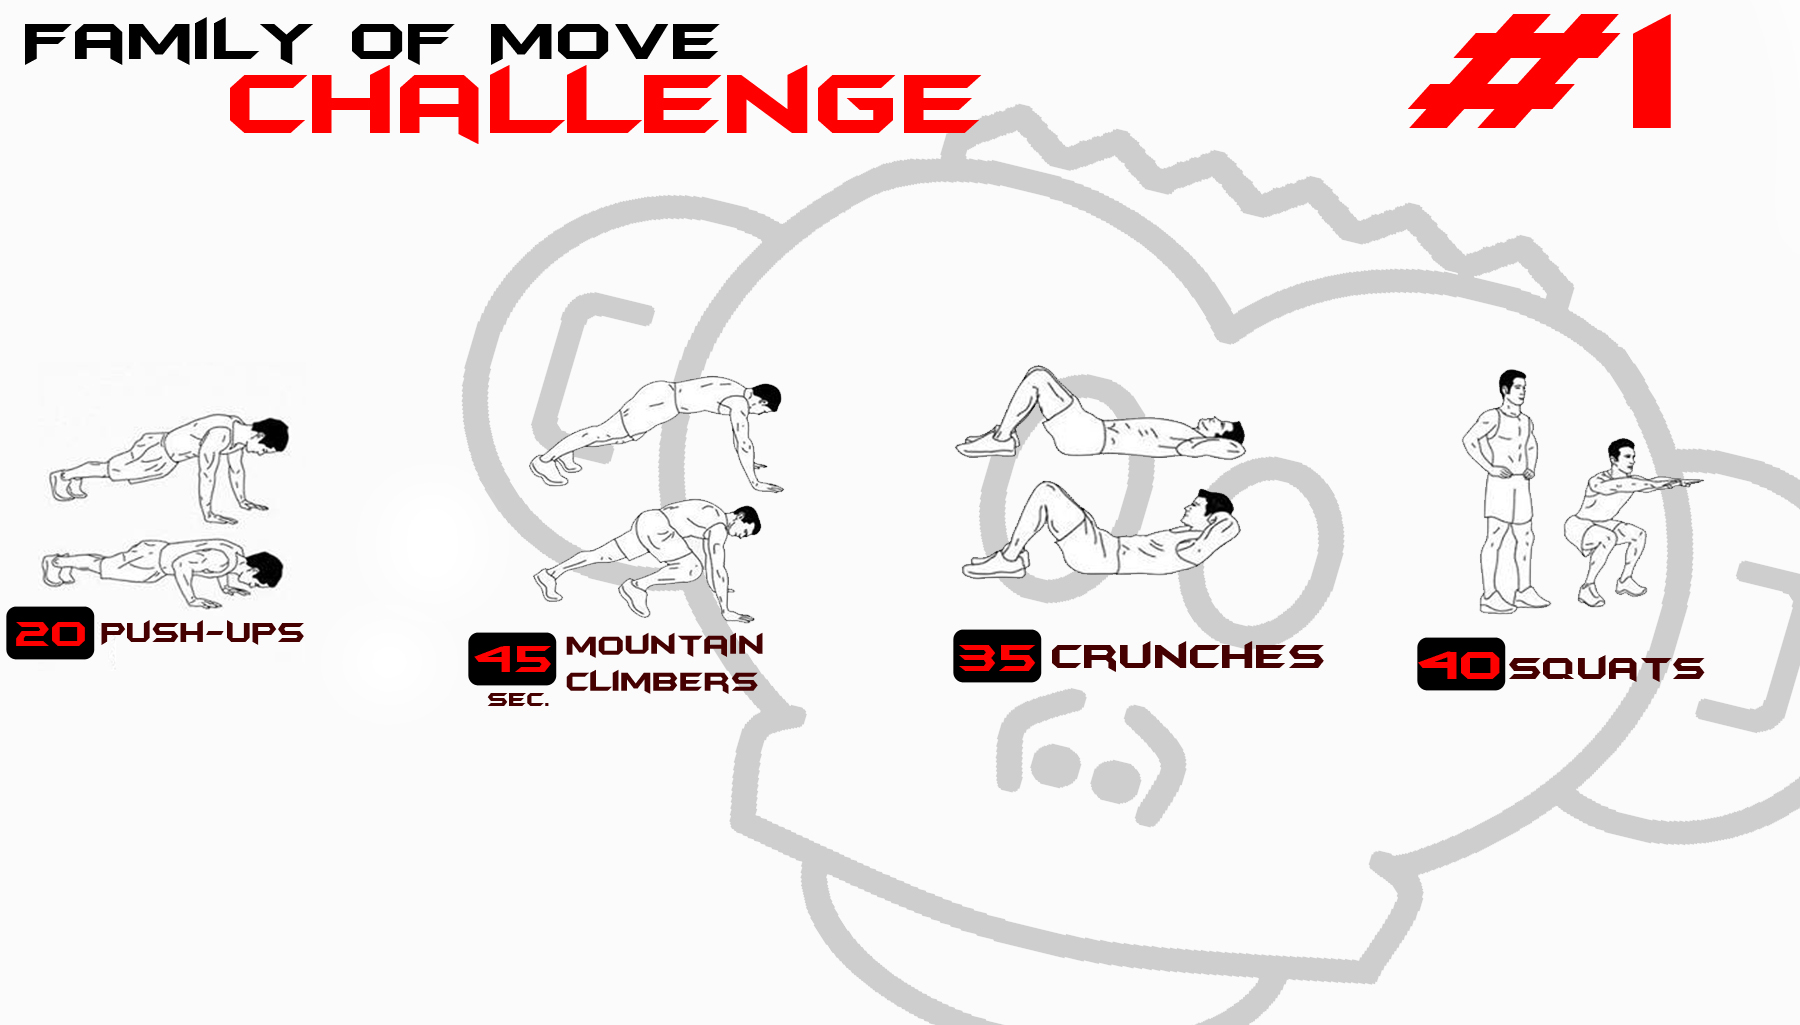 FamilyOfMove-challenge-1